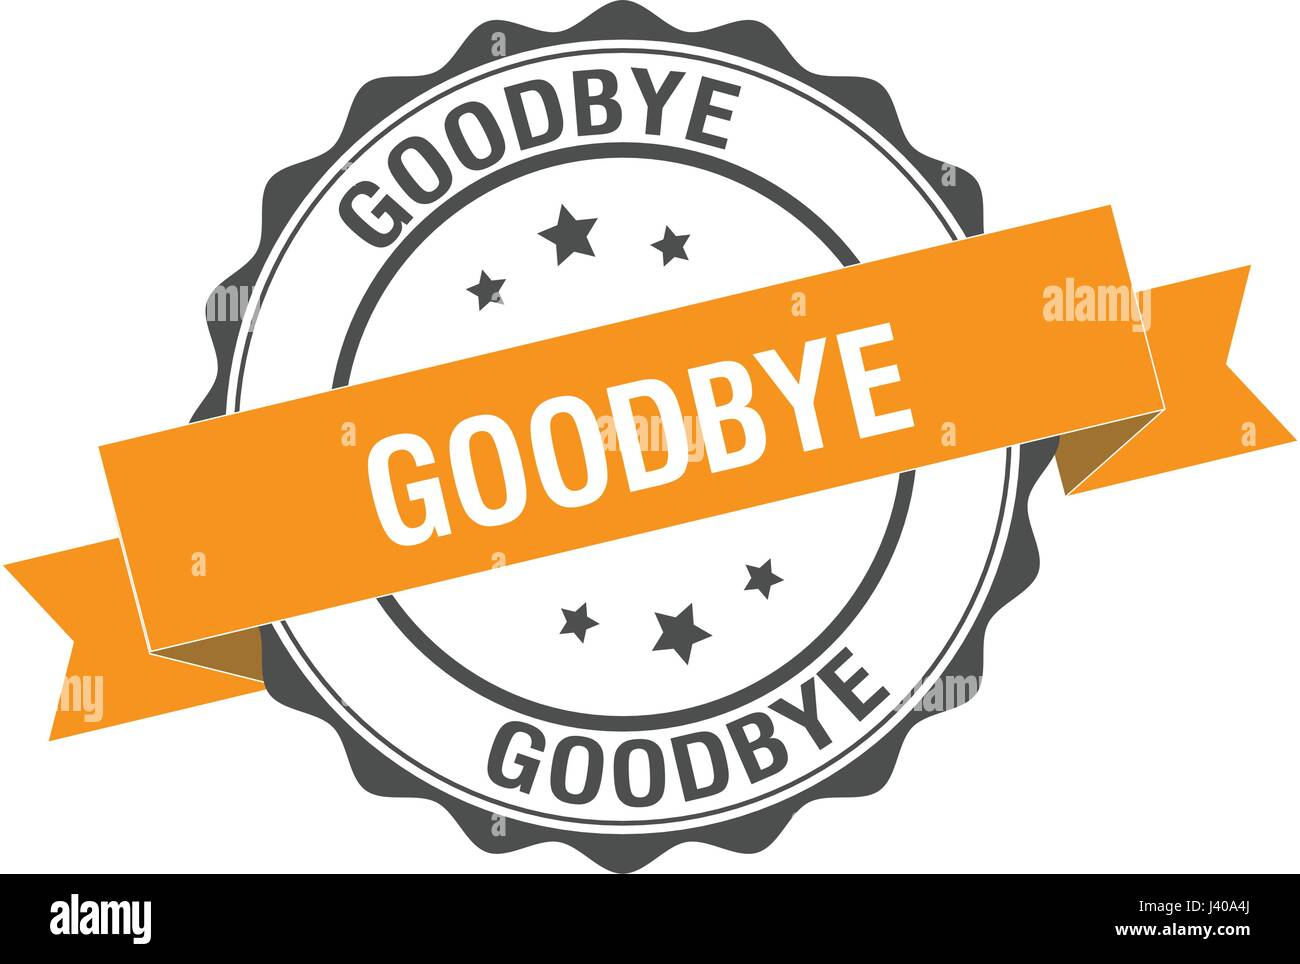 Goodbye stamp illustration - Stock Image